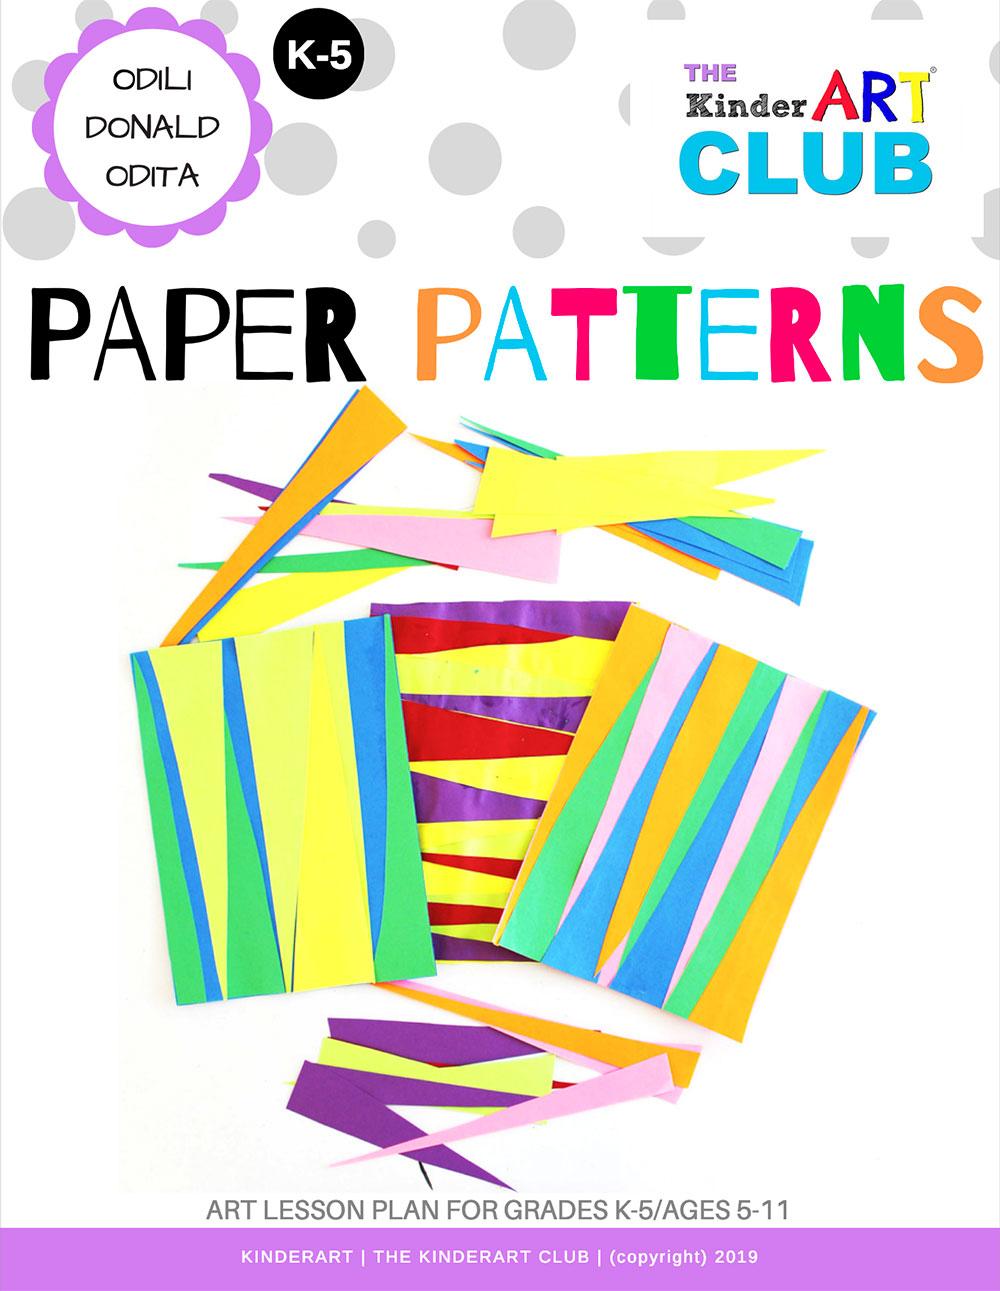 odita_paper_patterns